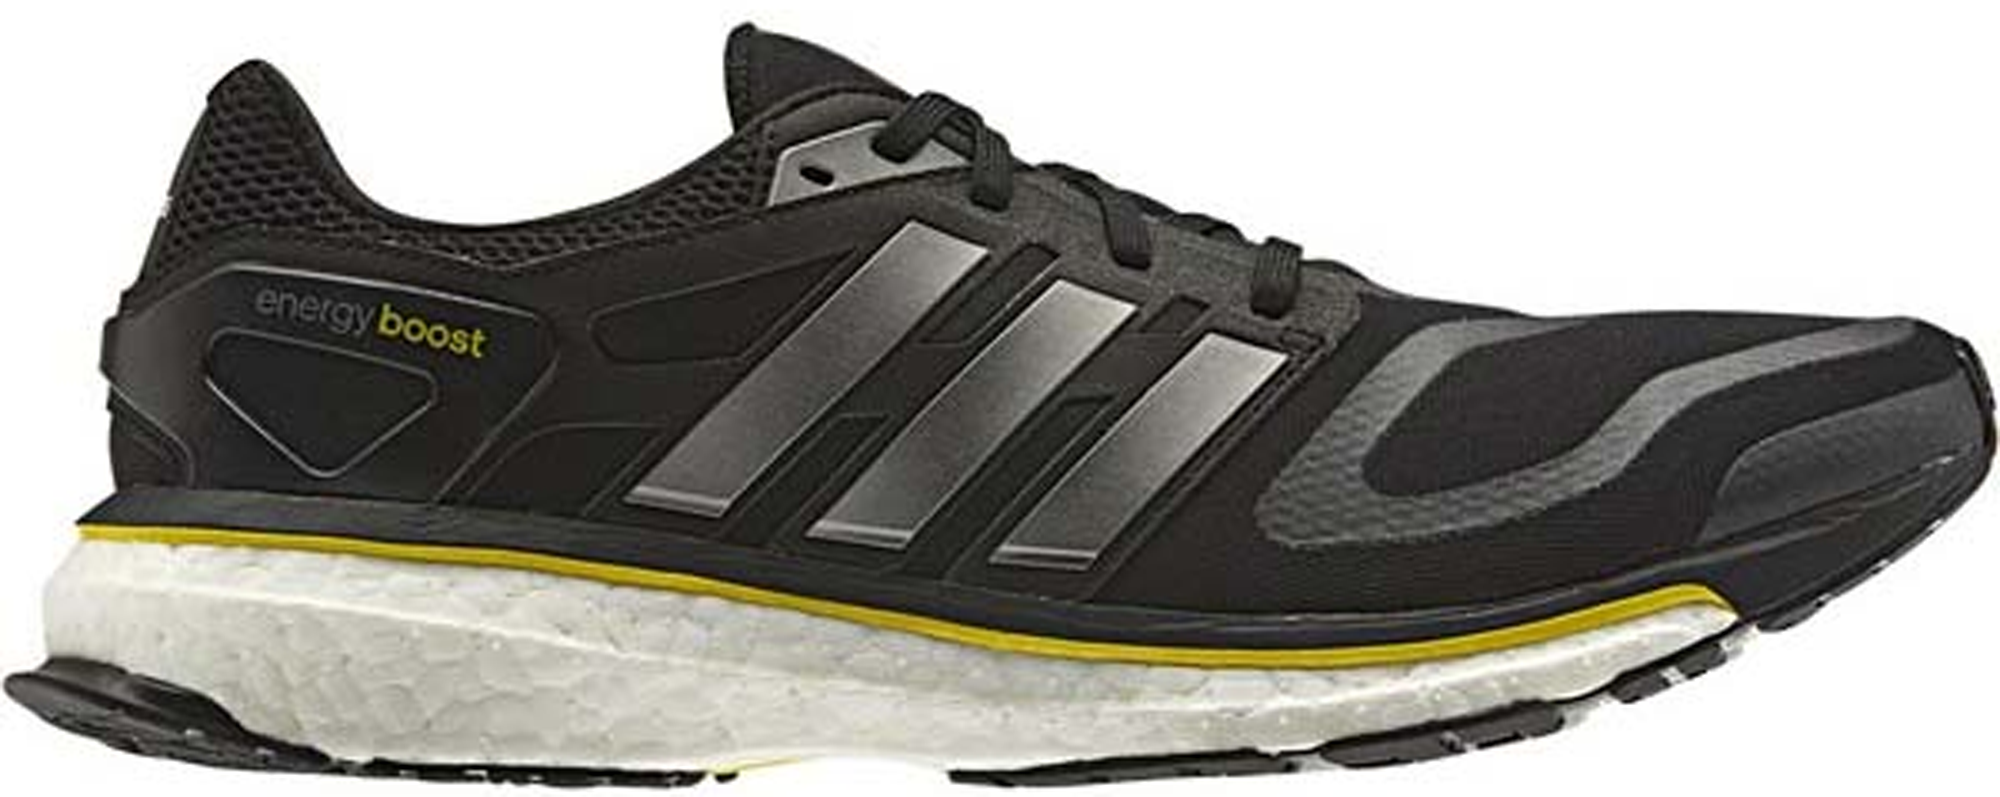 adidas Energy Boost OG 5th Anniversary Black Yellow